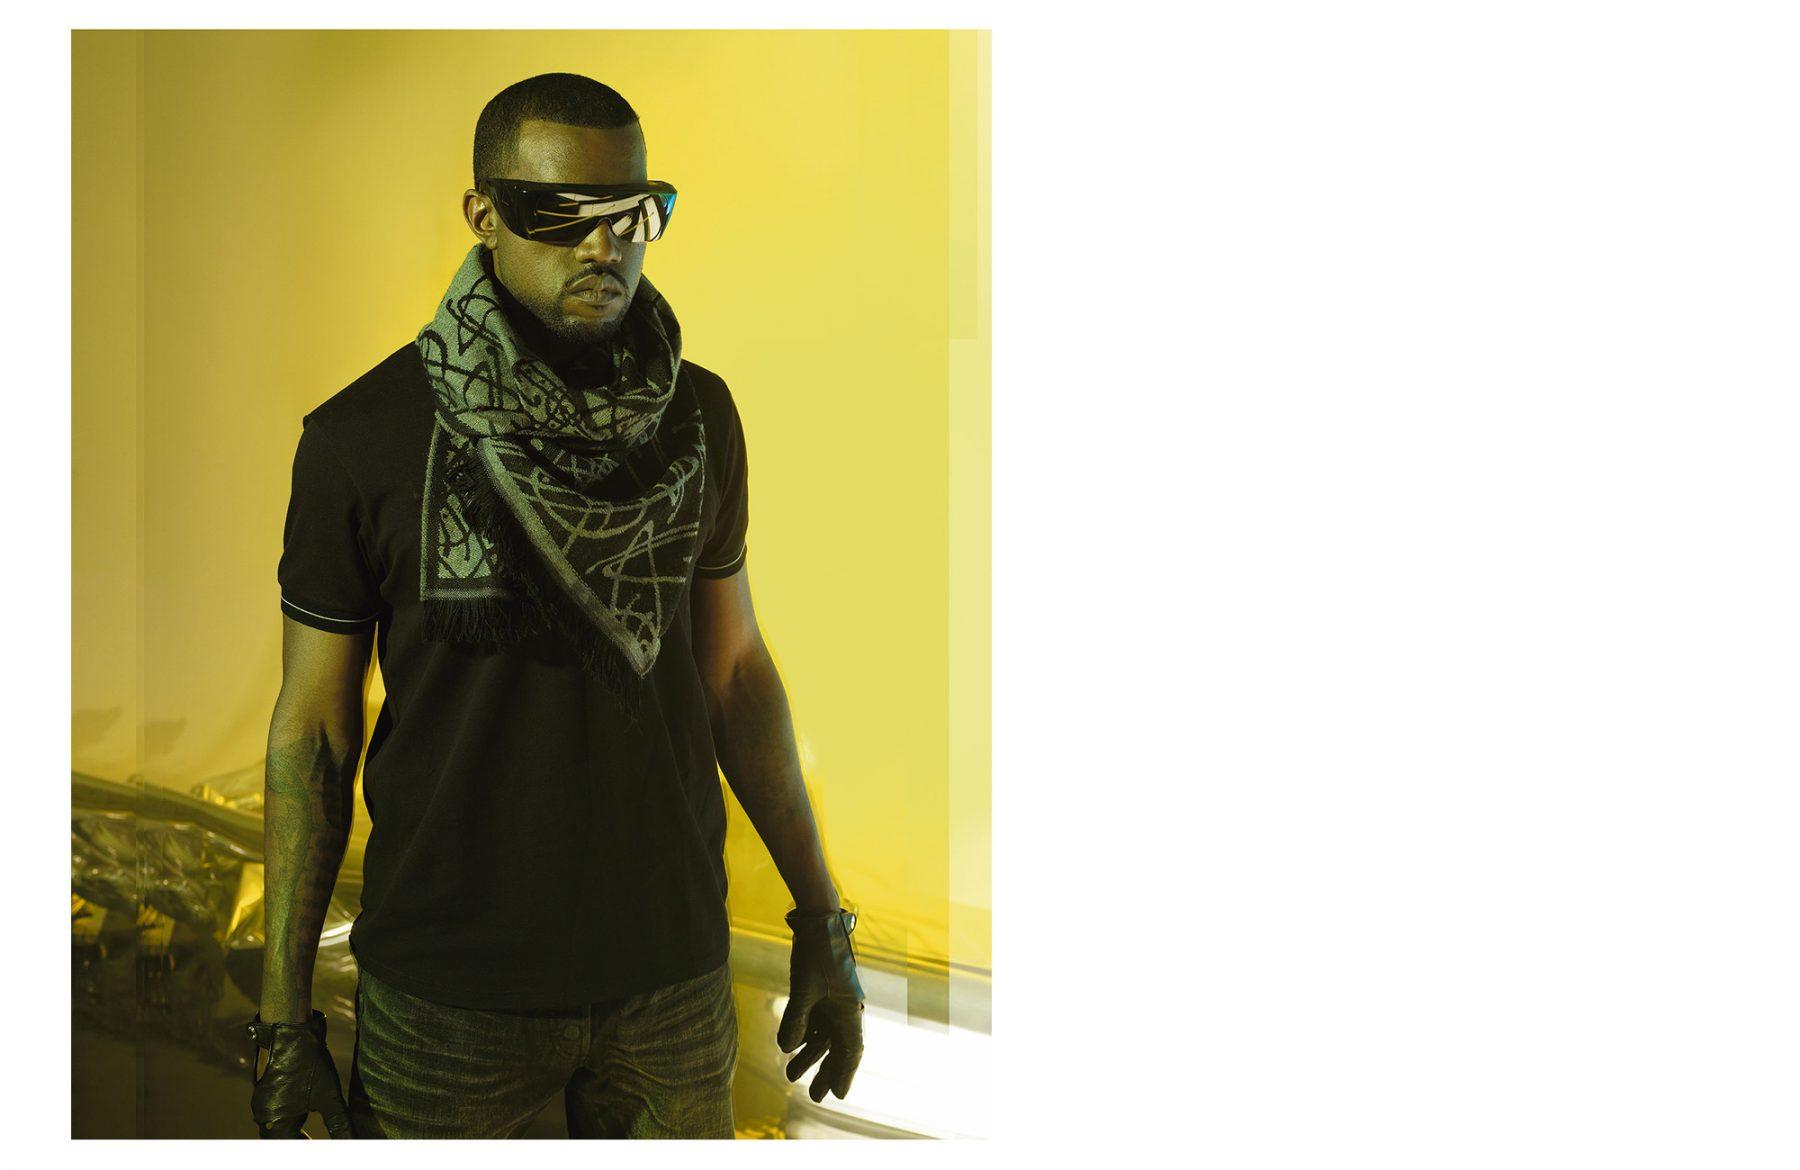 Kanye West - 1 of 1